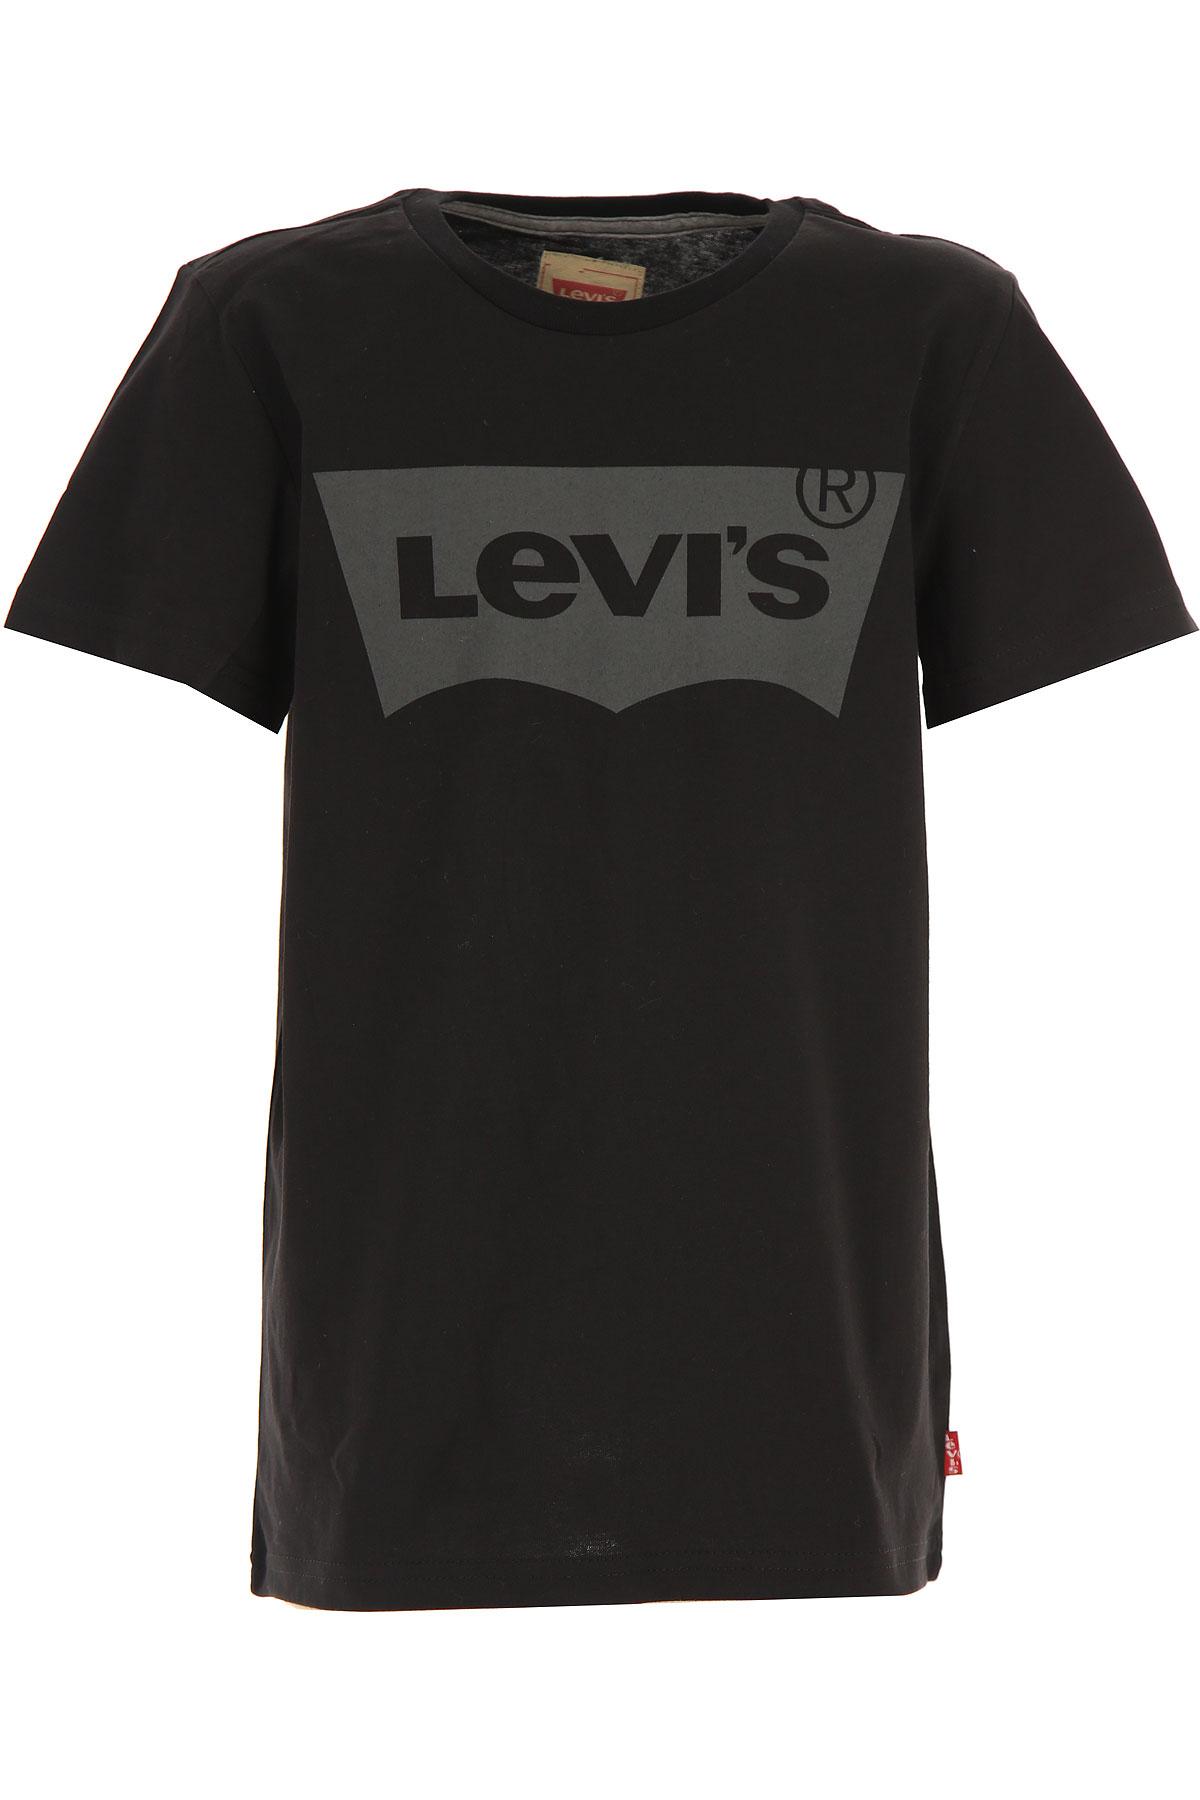 Levis Kids T-Shirt for Boys On Sale, Black, Cotton, 2019, 10Y 14Y 16Y 8Y